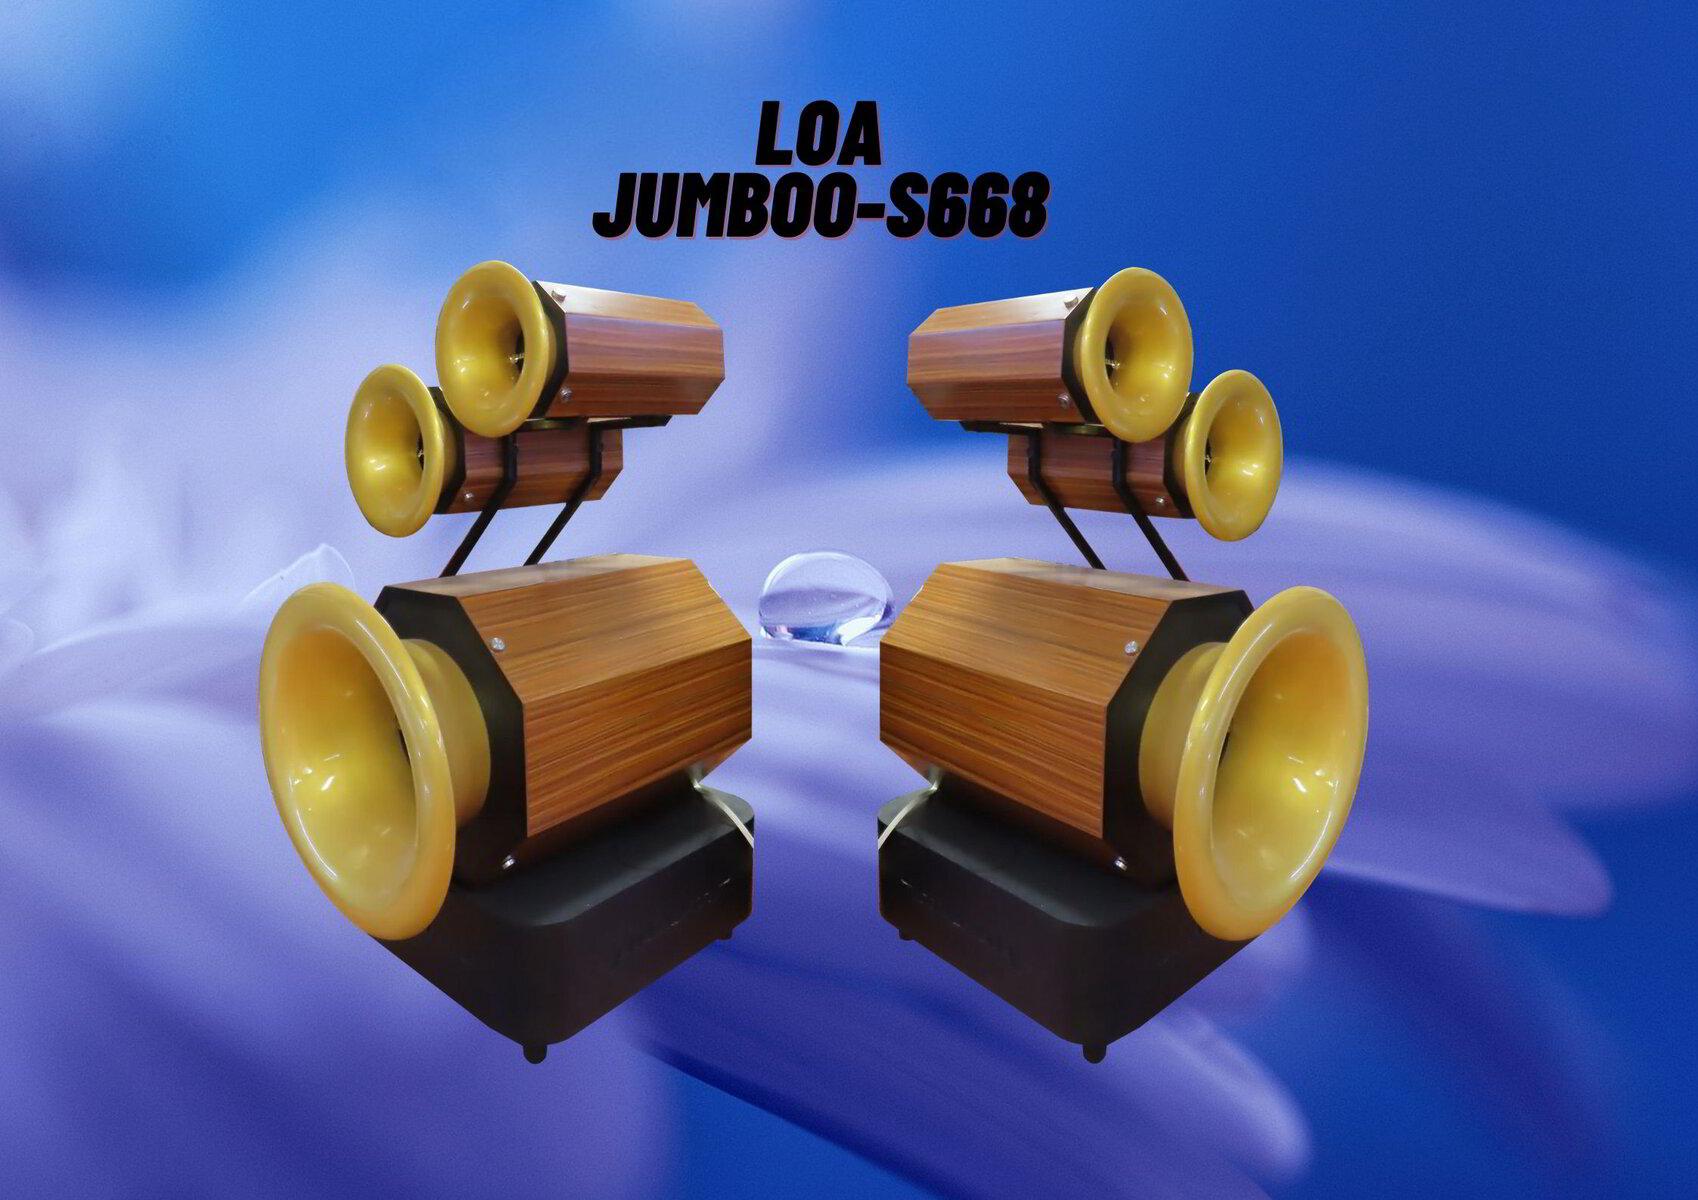 Loa JUMBOO-S668